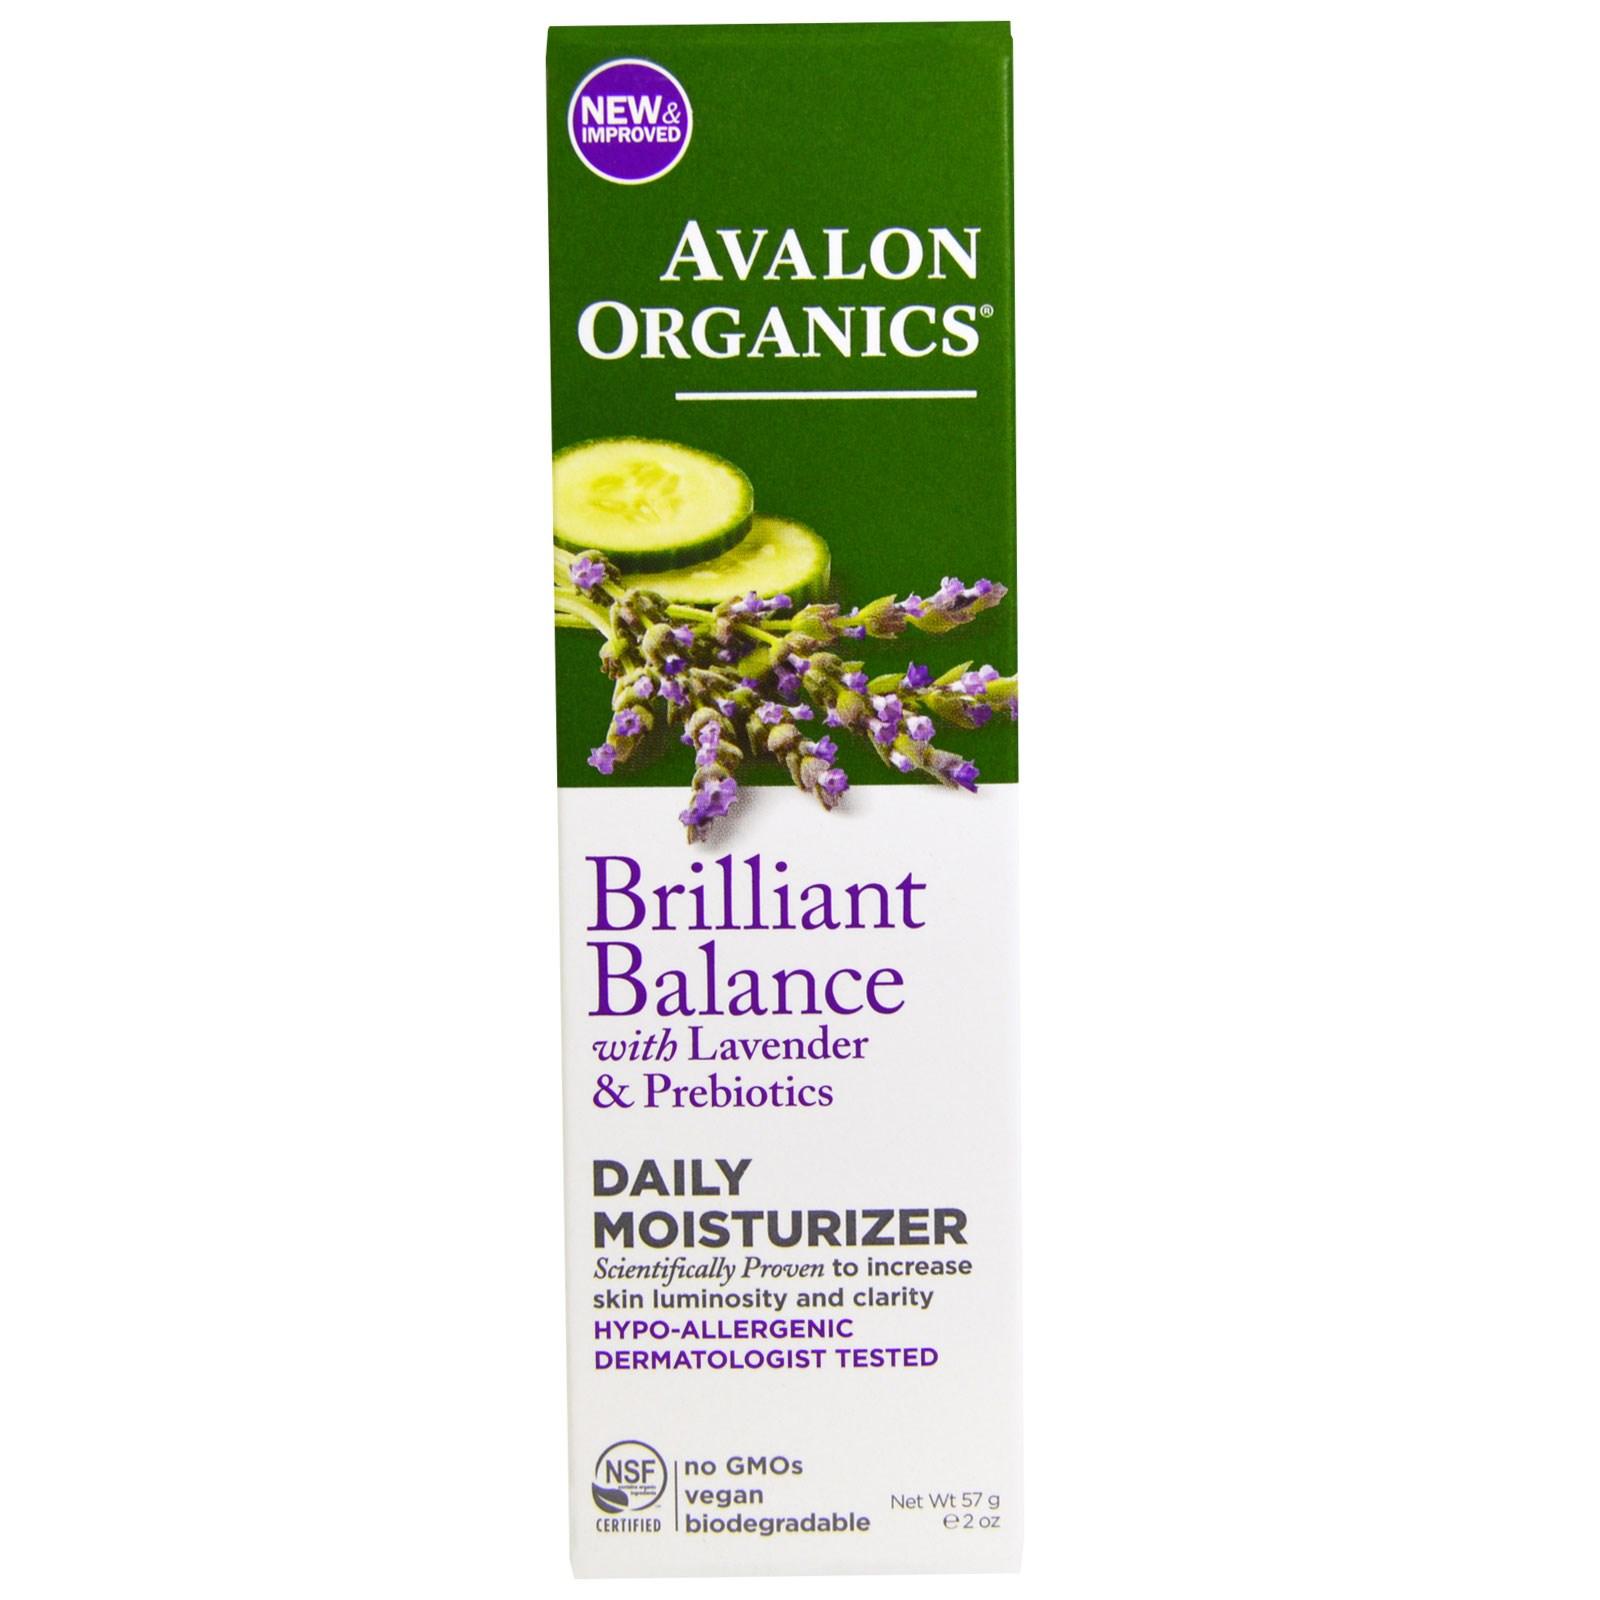 Avalon Organics Brilliant Balance with Lavender & Prebiotics Daily Moisturizer 2 oz (Pack of 2) Blackhead Remover Cleaner Deep Cleansing Peel off Face Mask, Black Mud, 50 mL